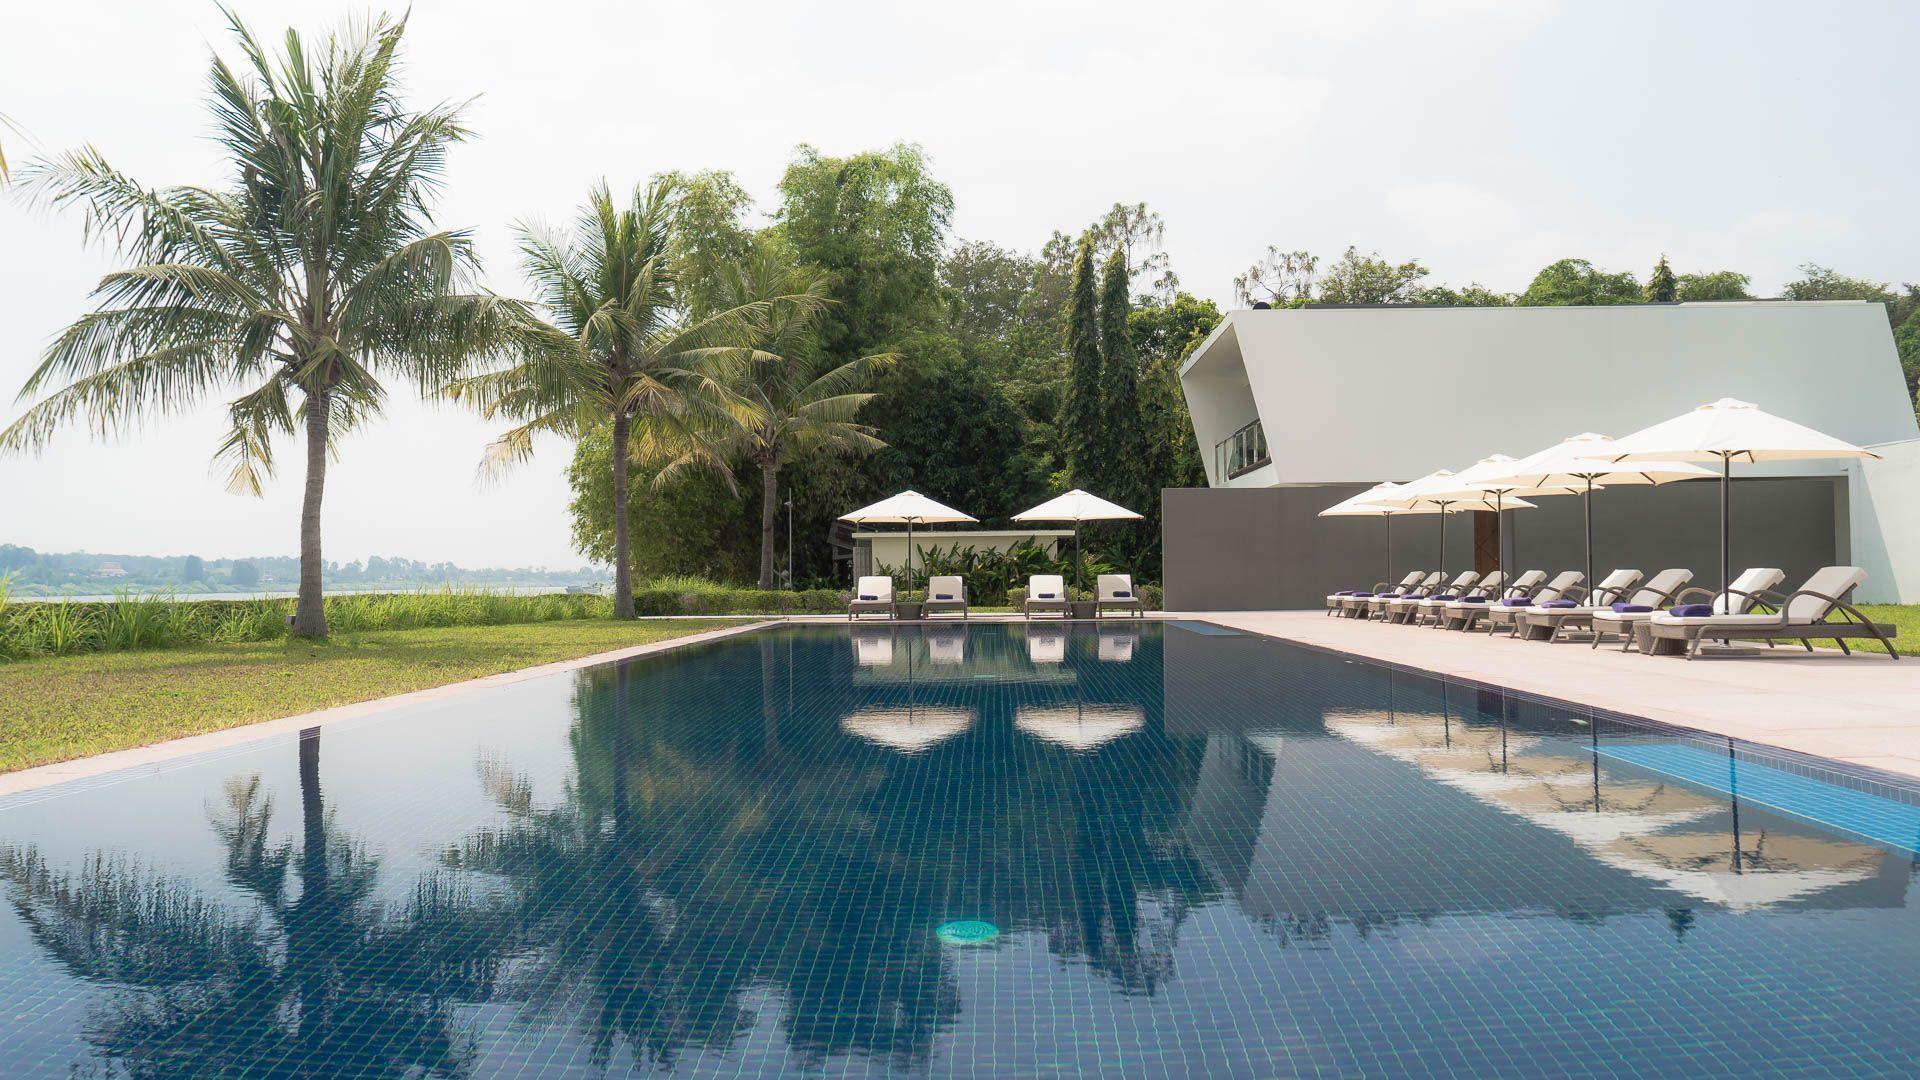 Lesvoyageuses-voyage-Phnom-Penh-cambodge-hotel-the-bale-experience-34